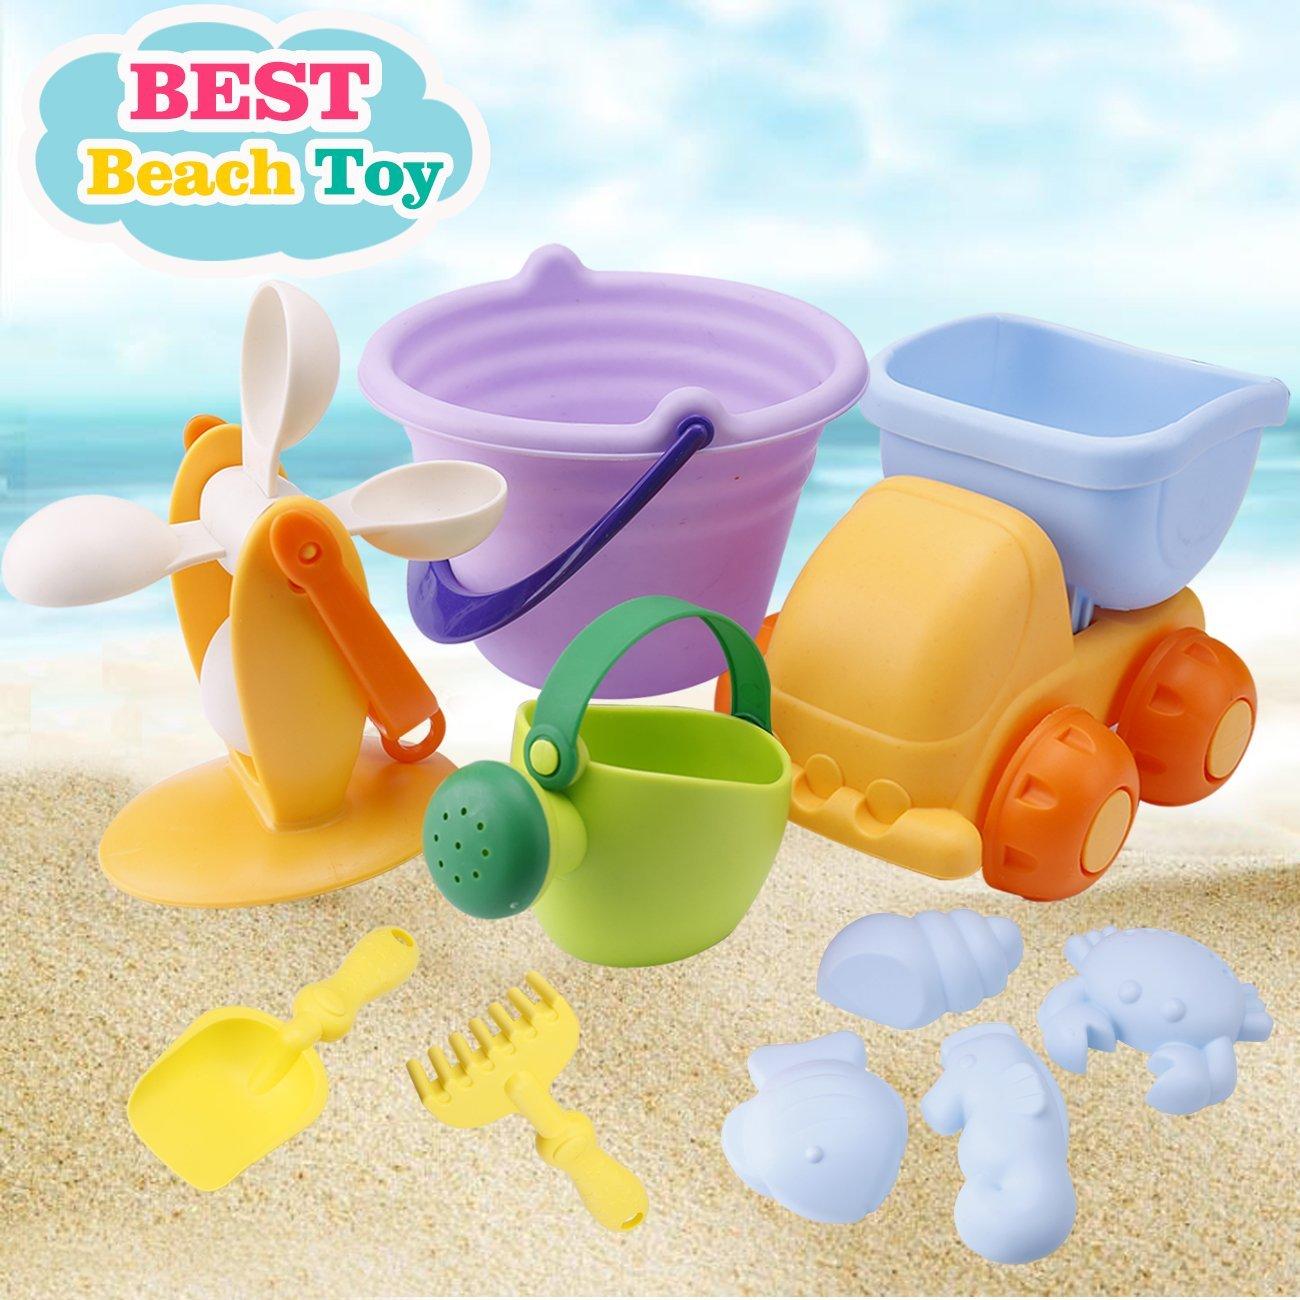 BeachToysSetforKidsToddlersBabySandToysforGirlsBoys,Soft10PiecesPoolToySetwithMeshBagTruck Bucket WateringCanWater WheeShovelsRakes,FishCrab SandMolds (10 Pieces Beach Toy)